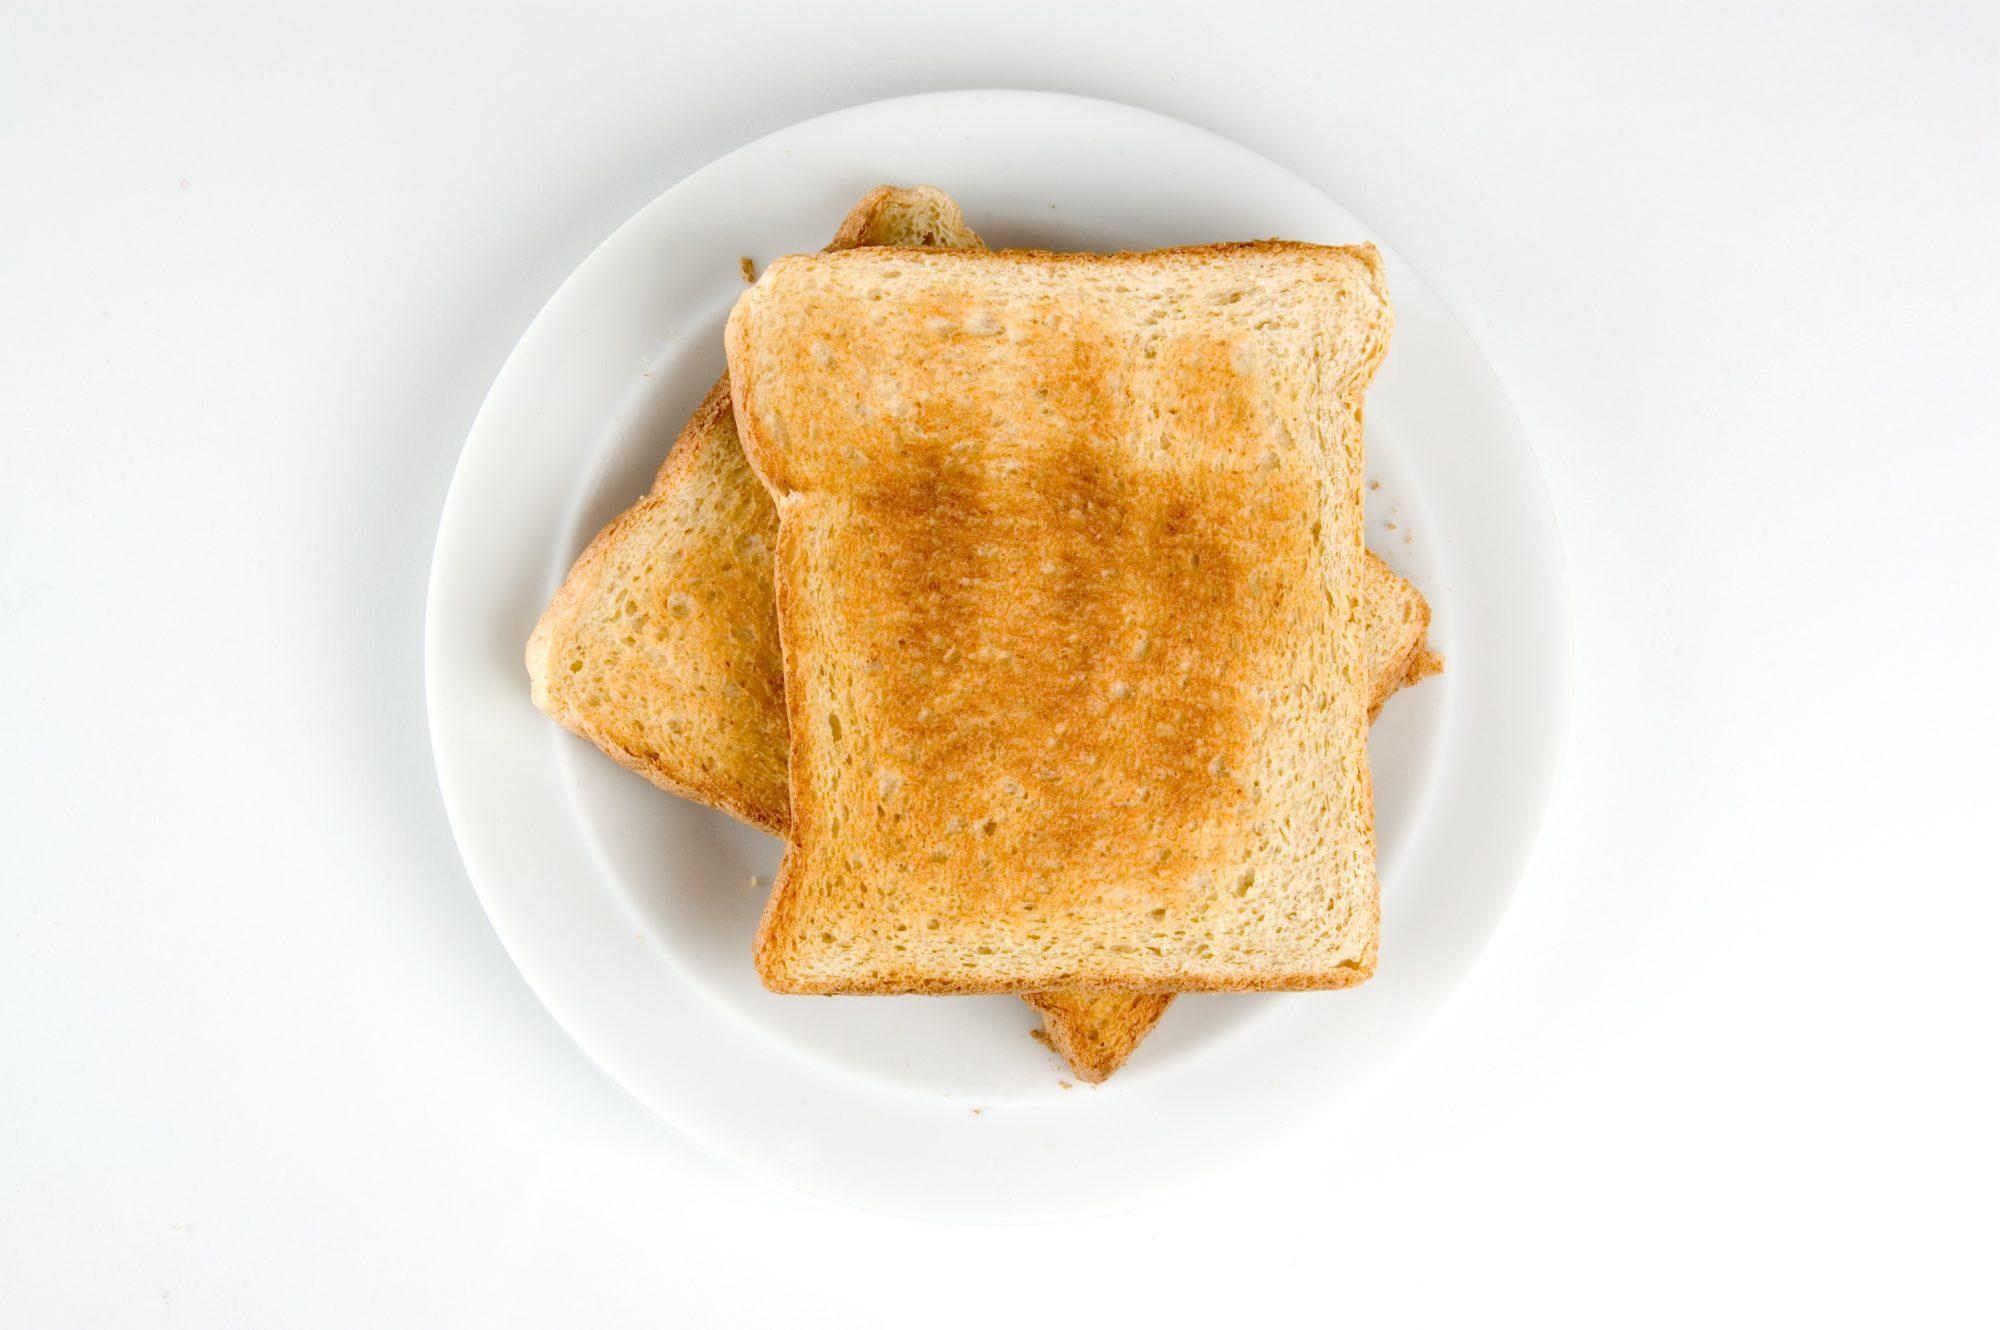 Toast Getty 2/7/20